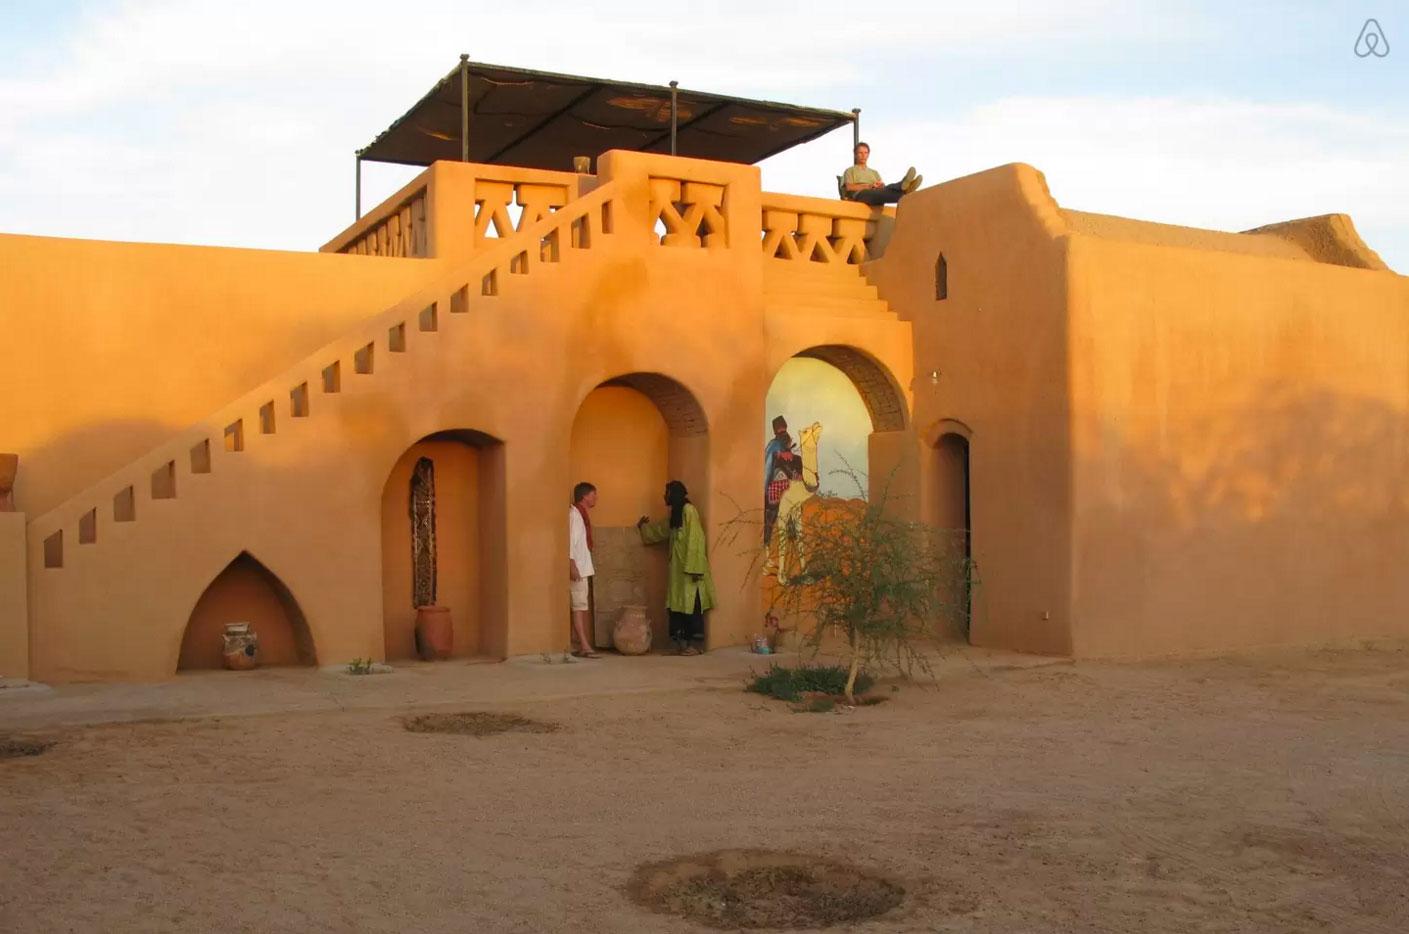 NIGER<br />Agadez<br />Maison